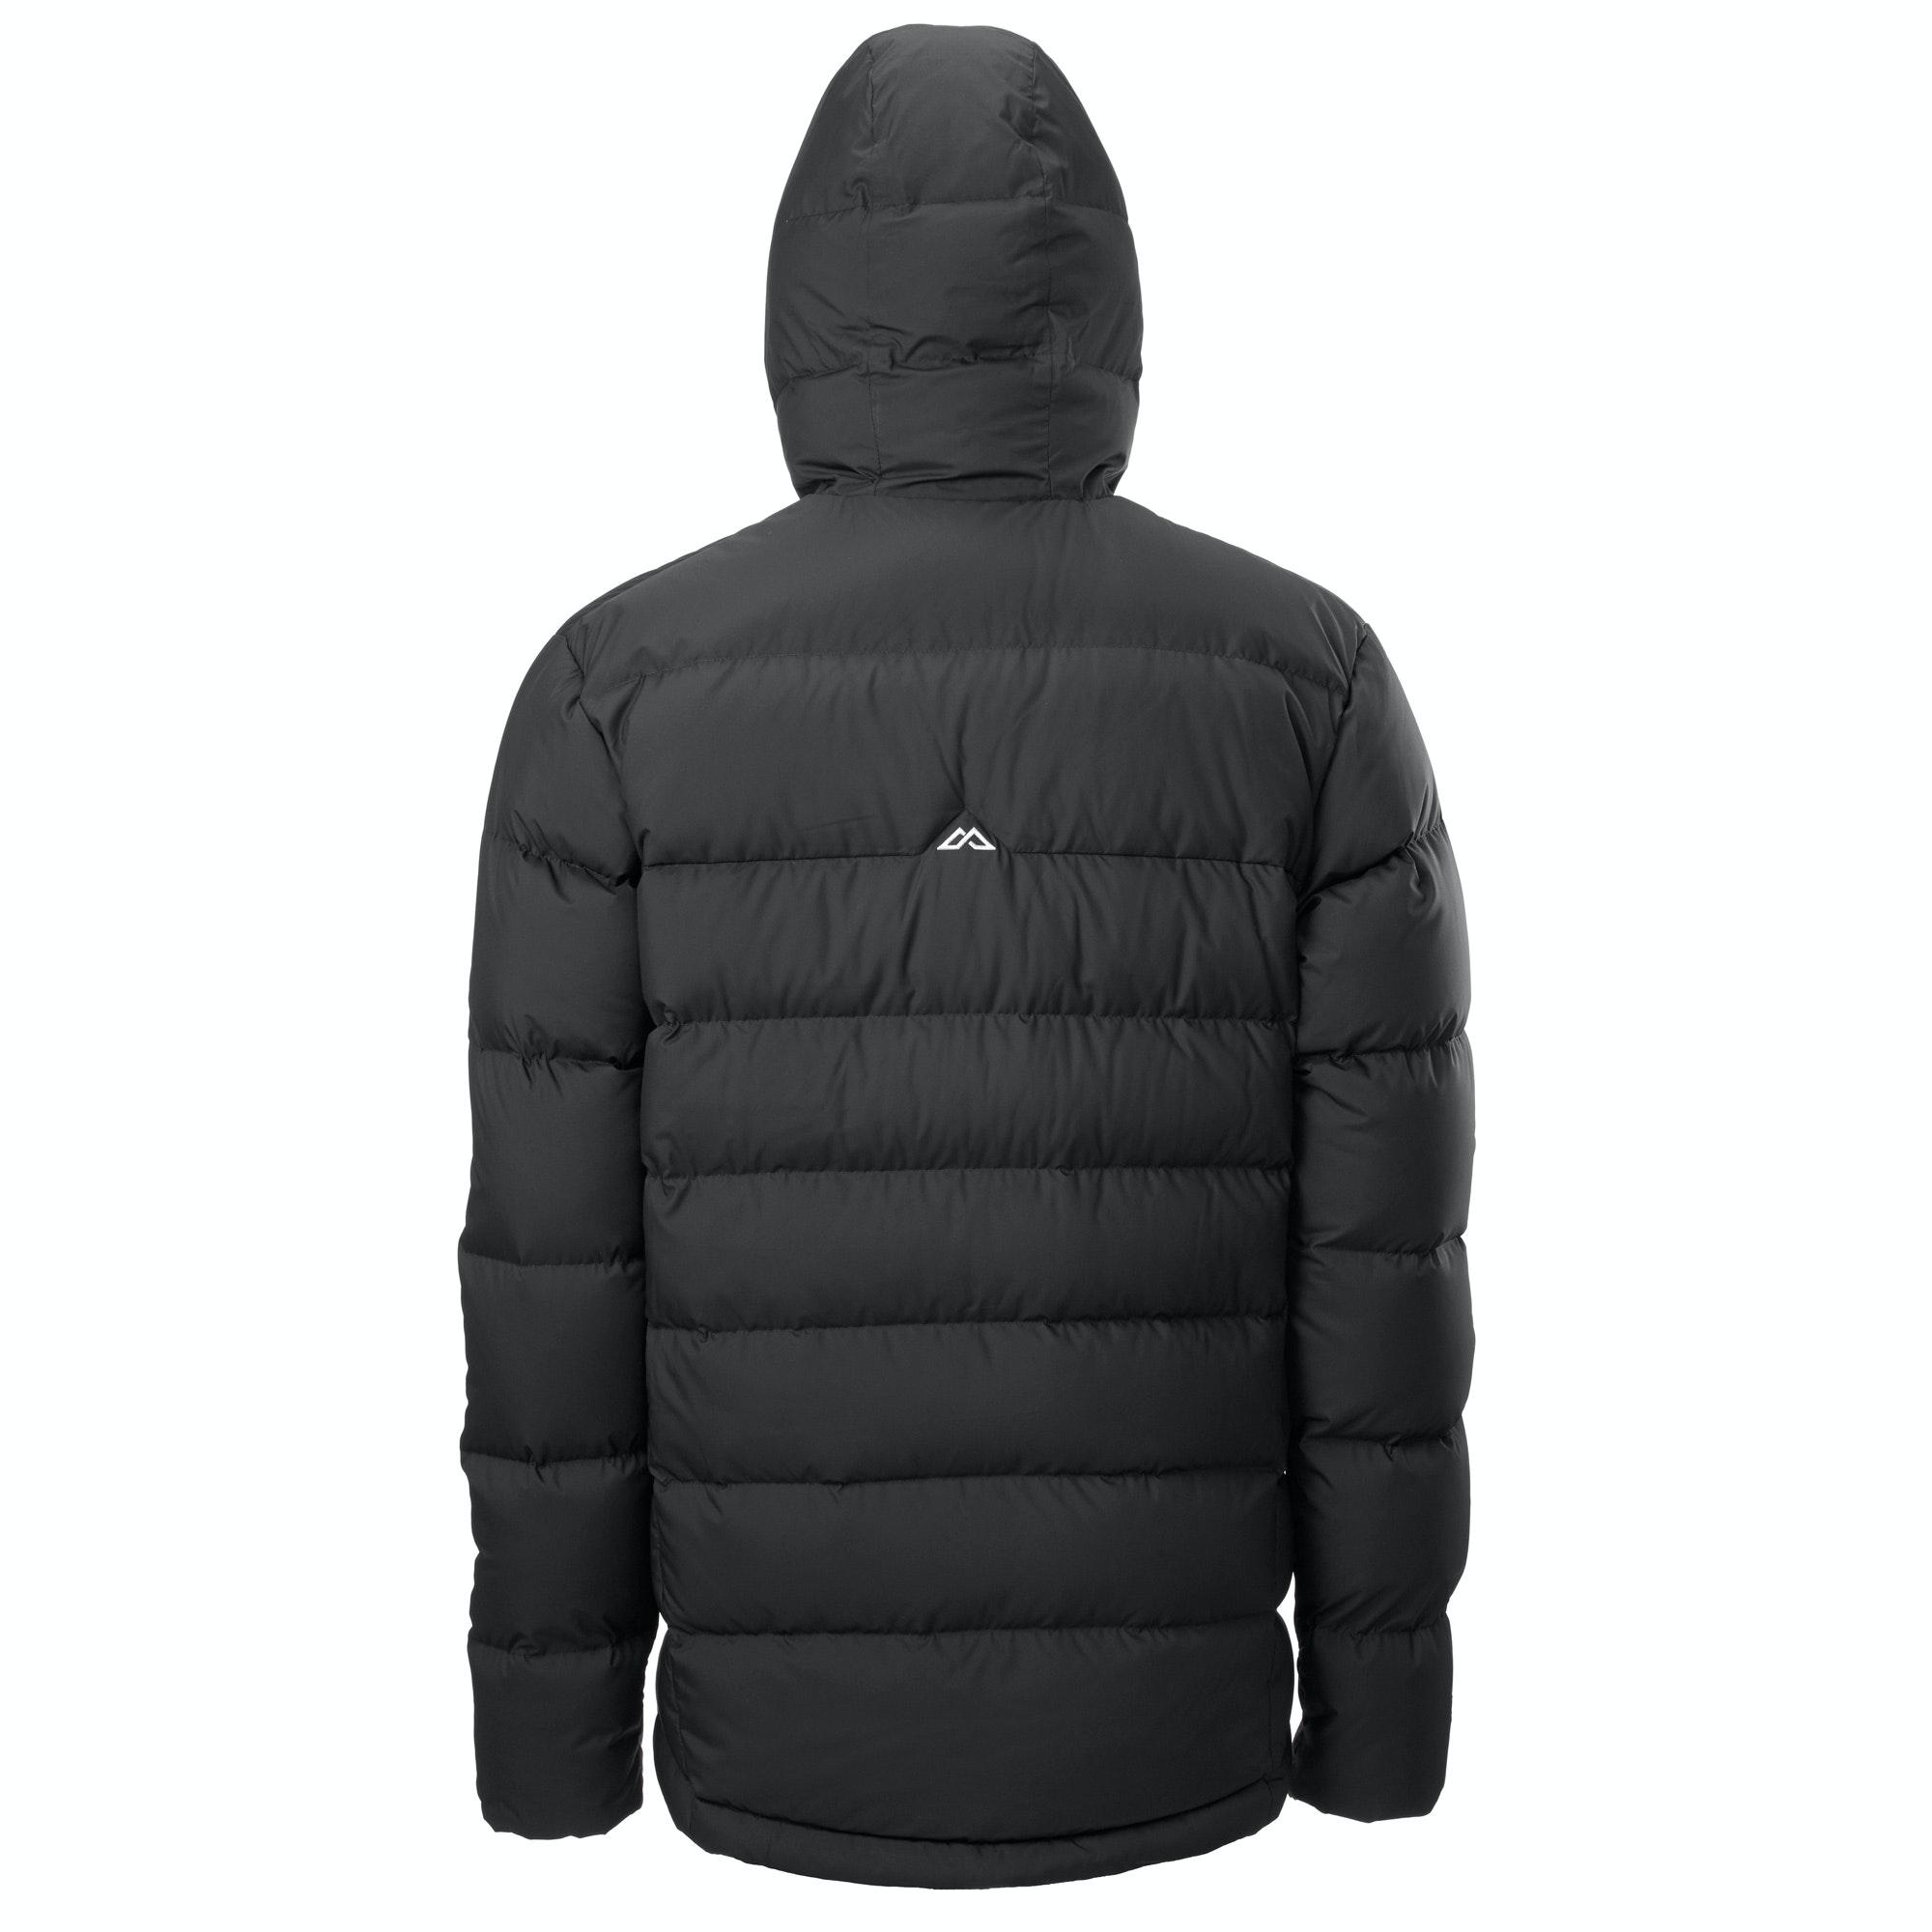 Epiq Men's Hooded Down Jacket v2